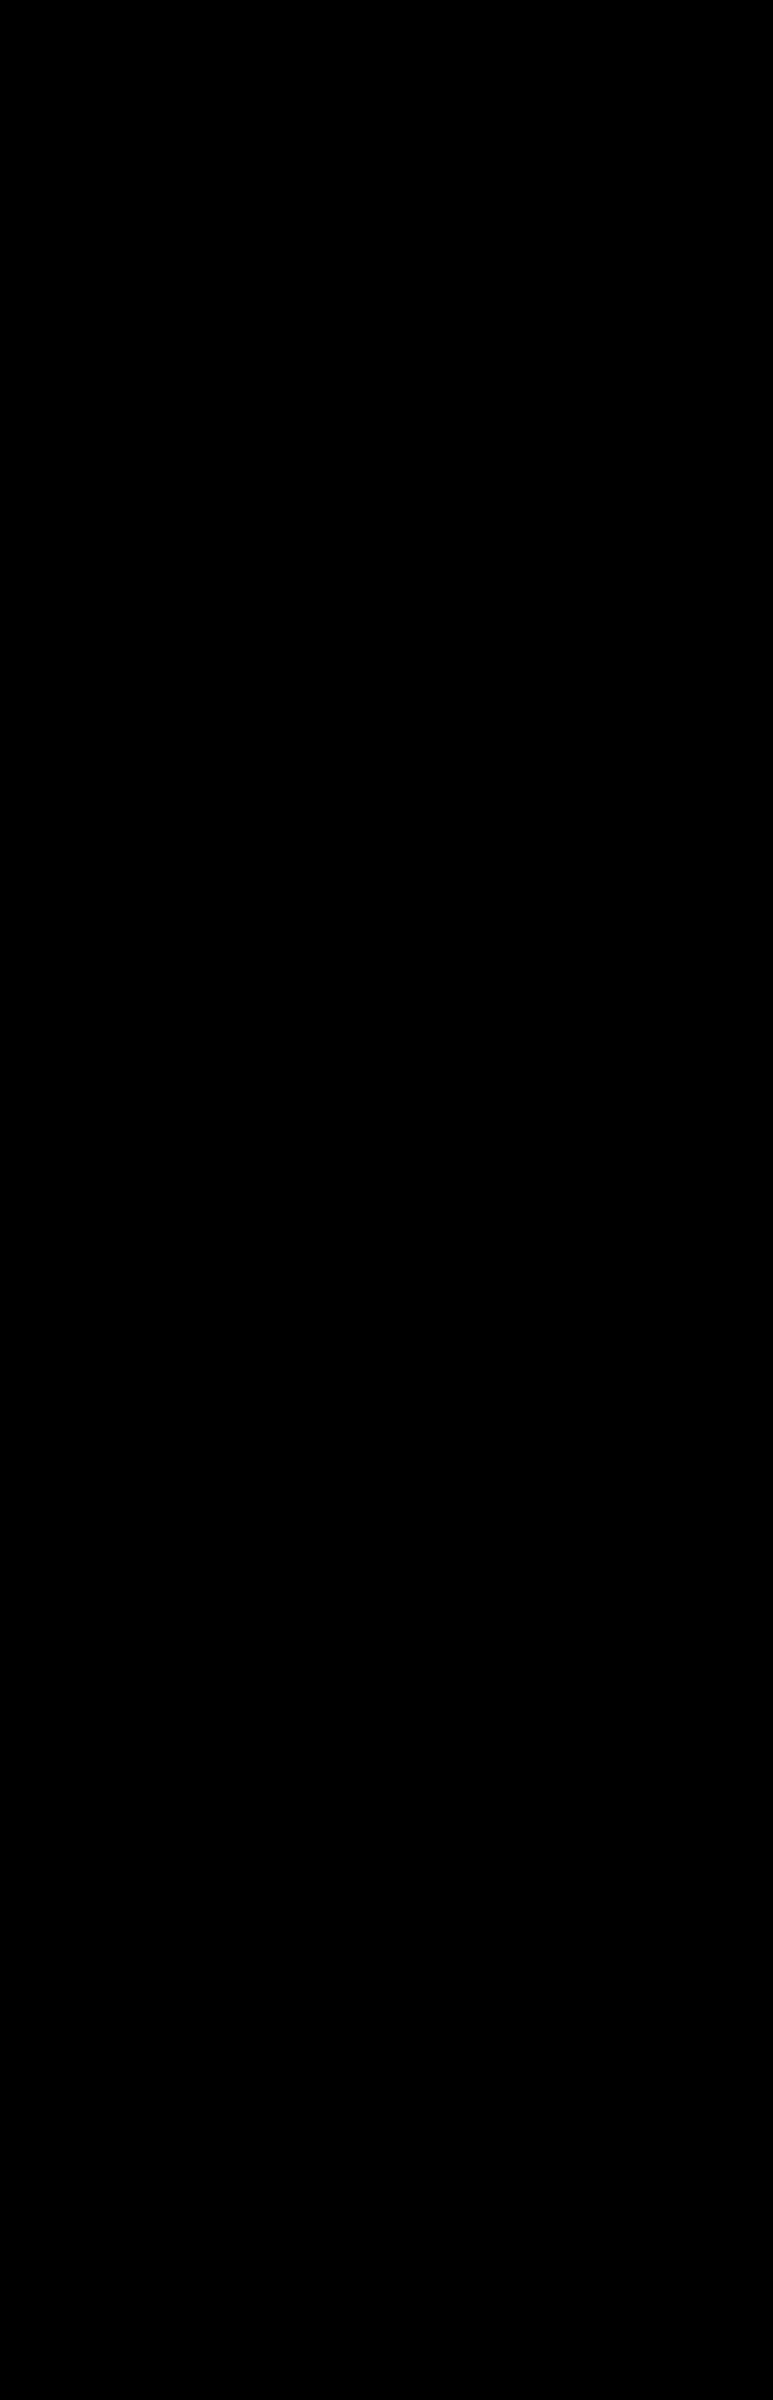 773x2400 Clipart